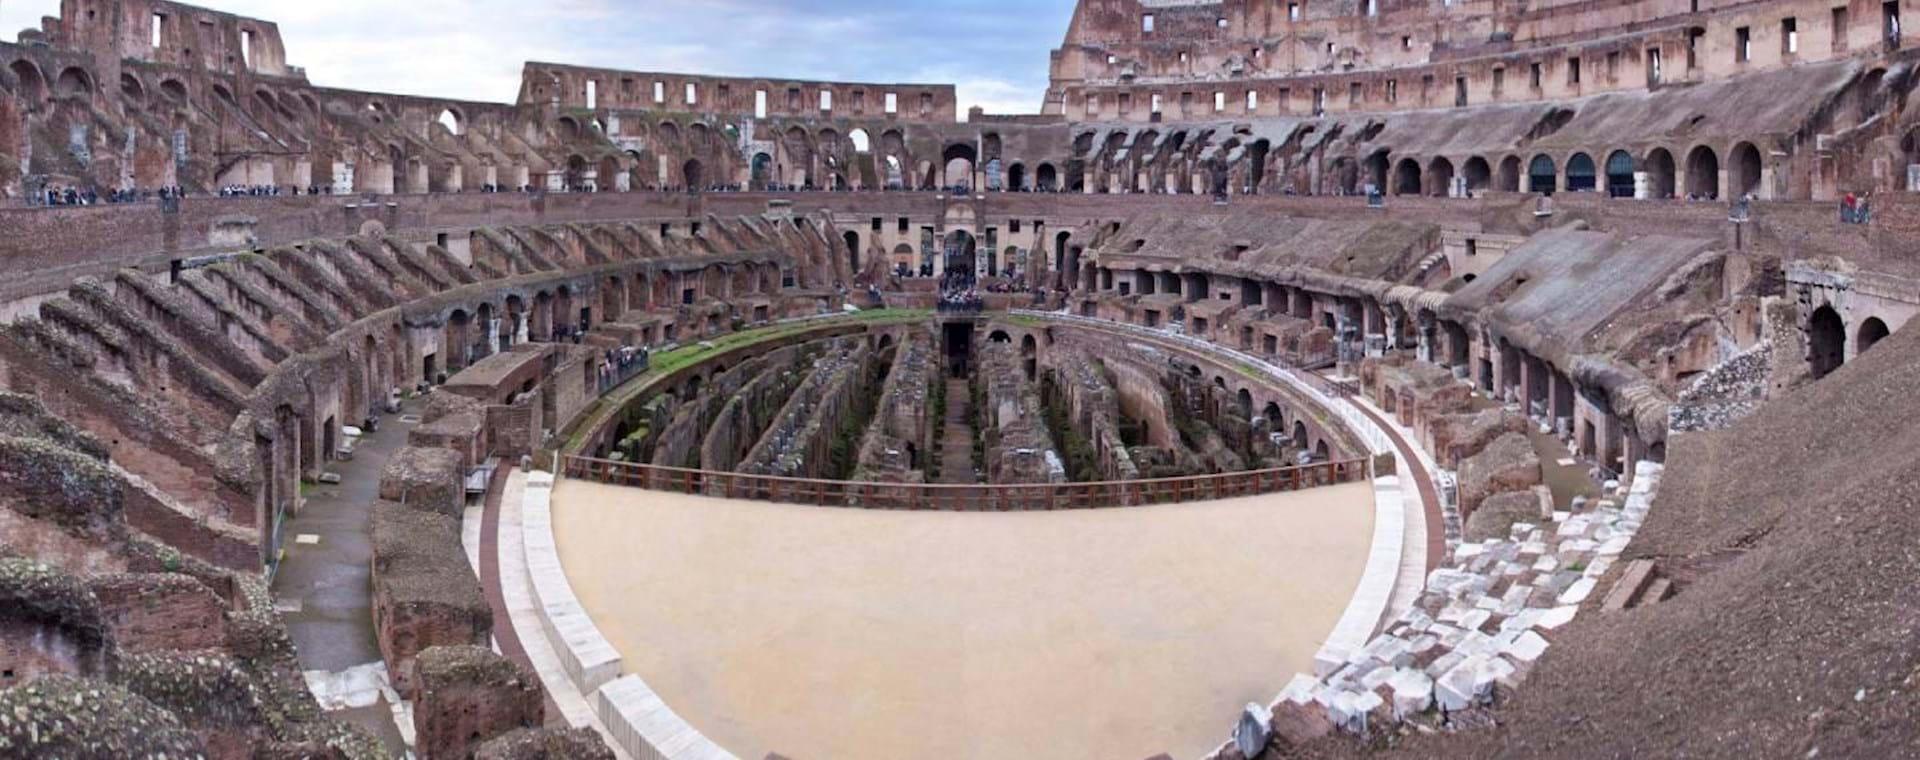 Colosseum Underground Tour with Gladiator Arena, 2nd Tier & Roman Forum